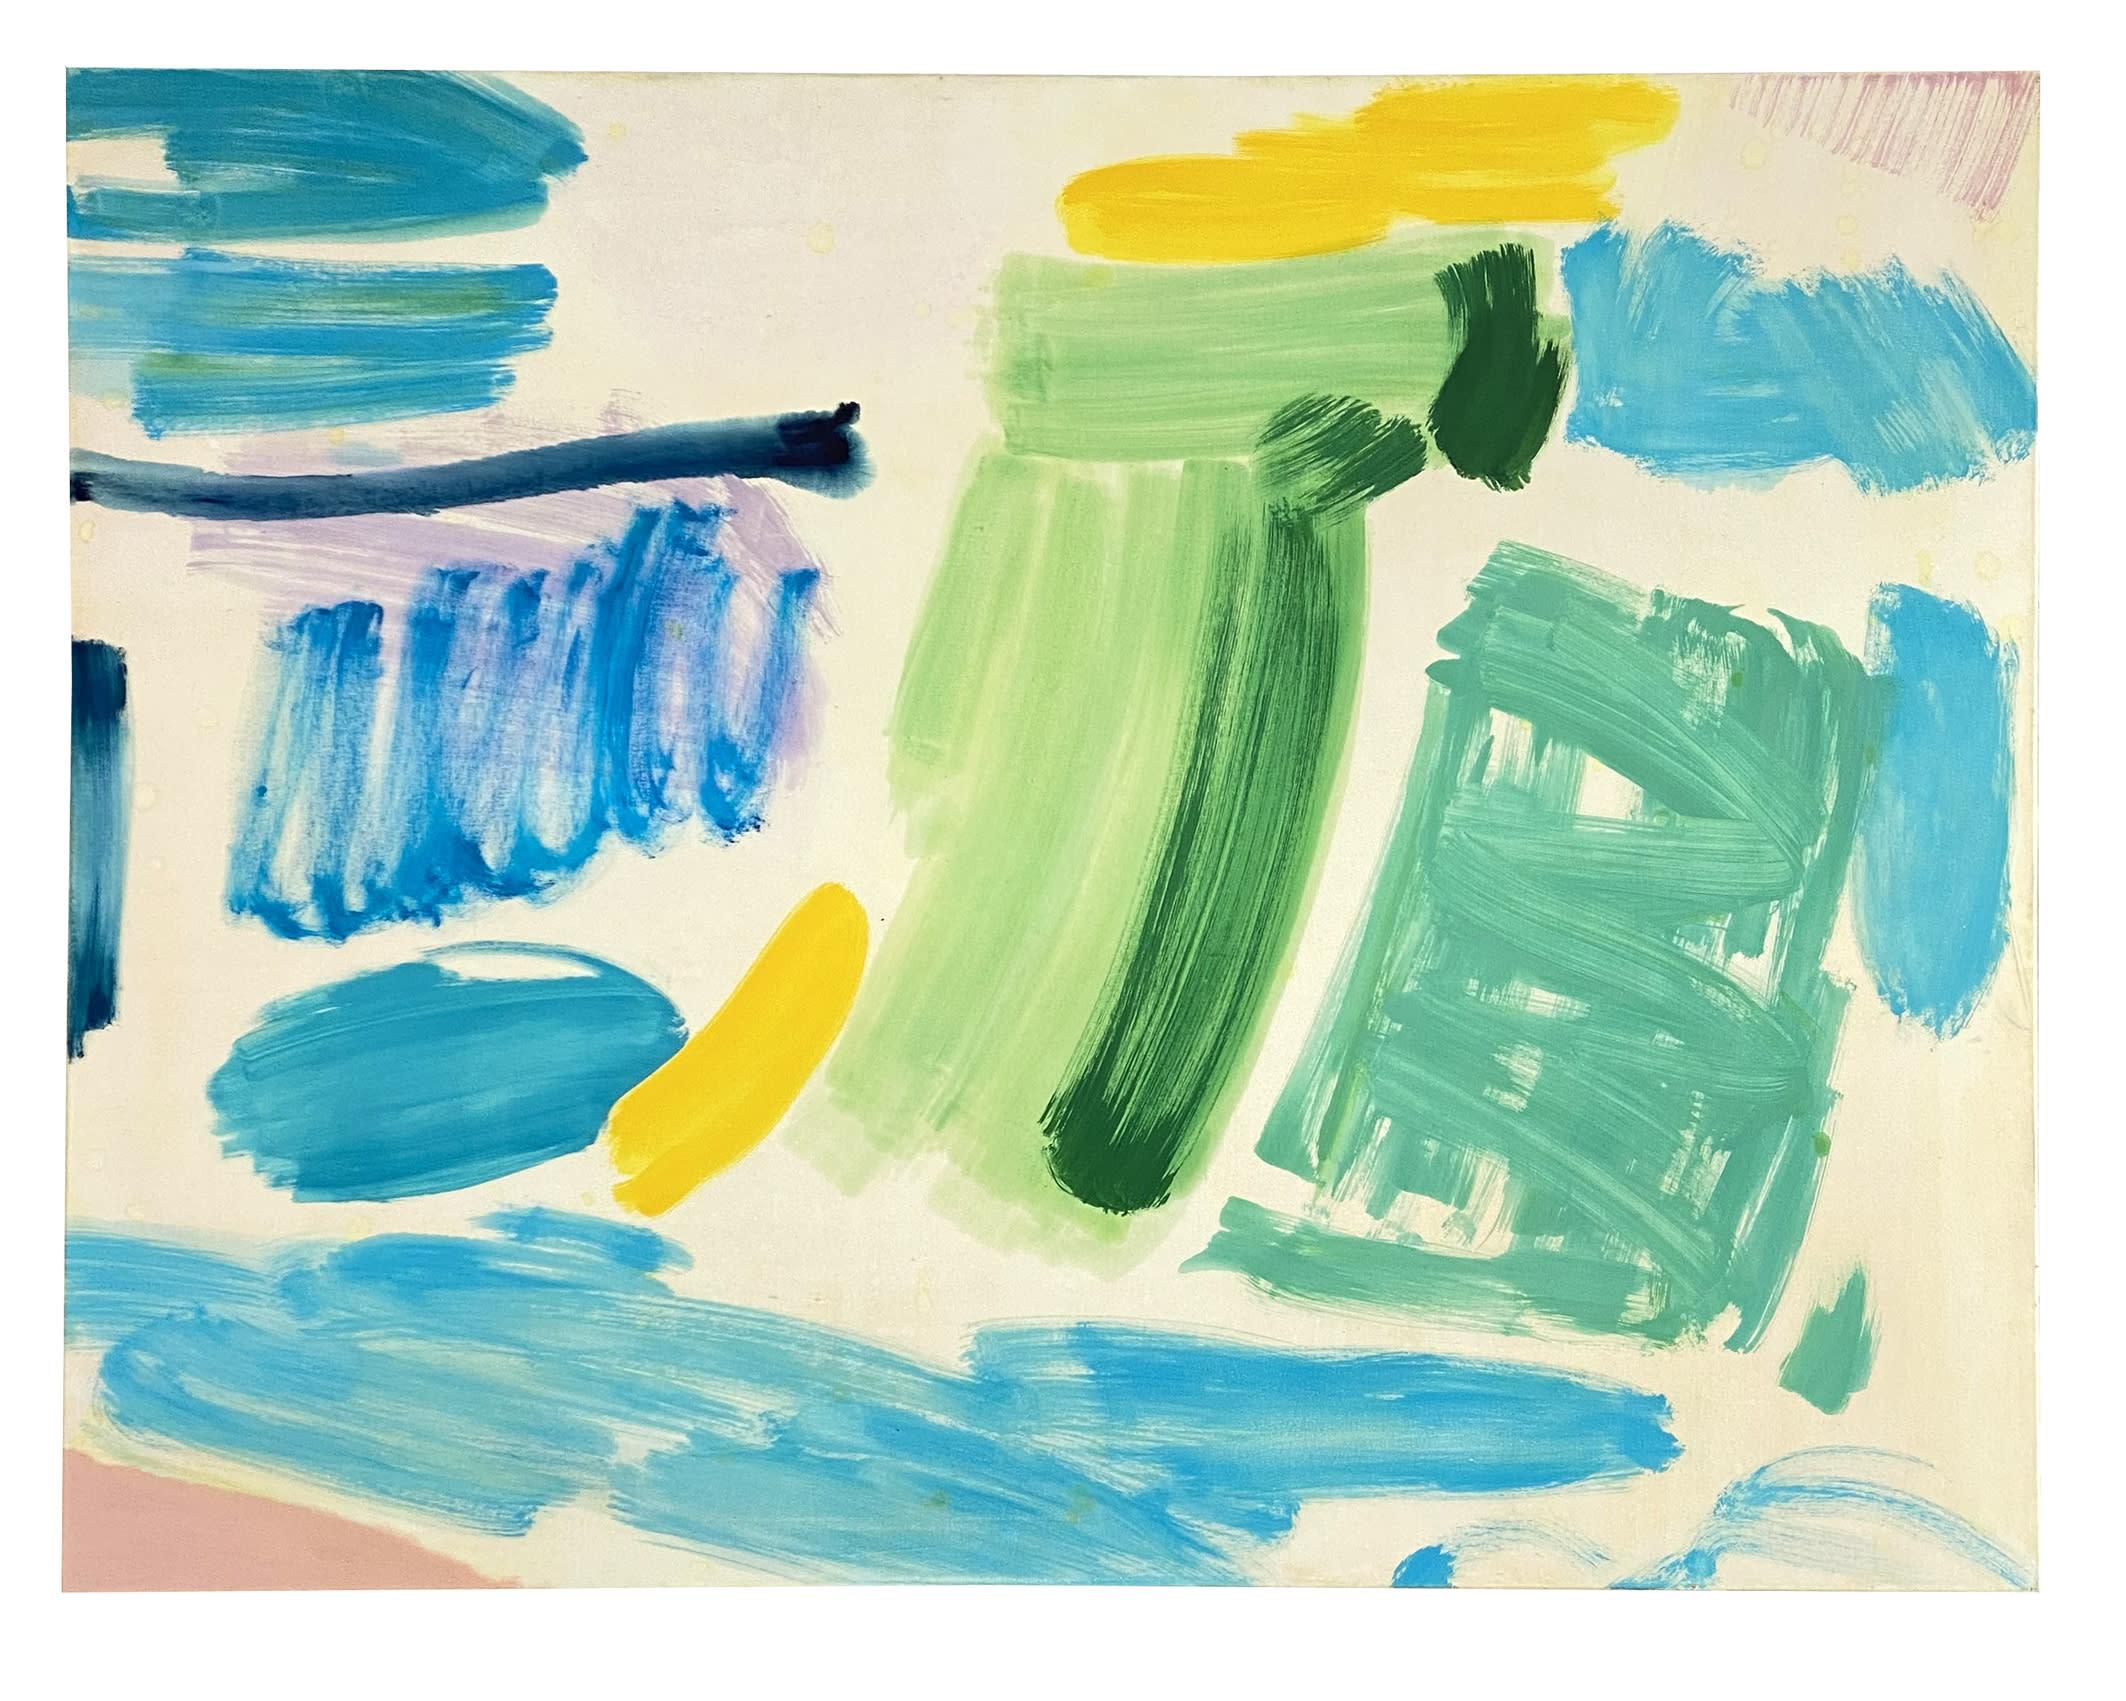 "<span class=""link fancybox-details-link""><a href=""/exhibitions/21/works/artworks979/"">View Detail Page</a></span><div class=""artist""><strong>Tim Braden</strong></div><div class=""title""><em>Prussian, Yellow and Green Dash</em>, 2018</div><div class=""medium"">Oil on canvas</div><div class=""dimensions"">130x170cm (51x67"")</div>"